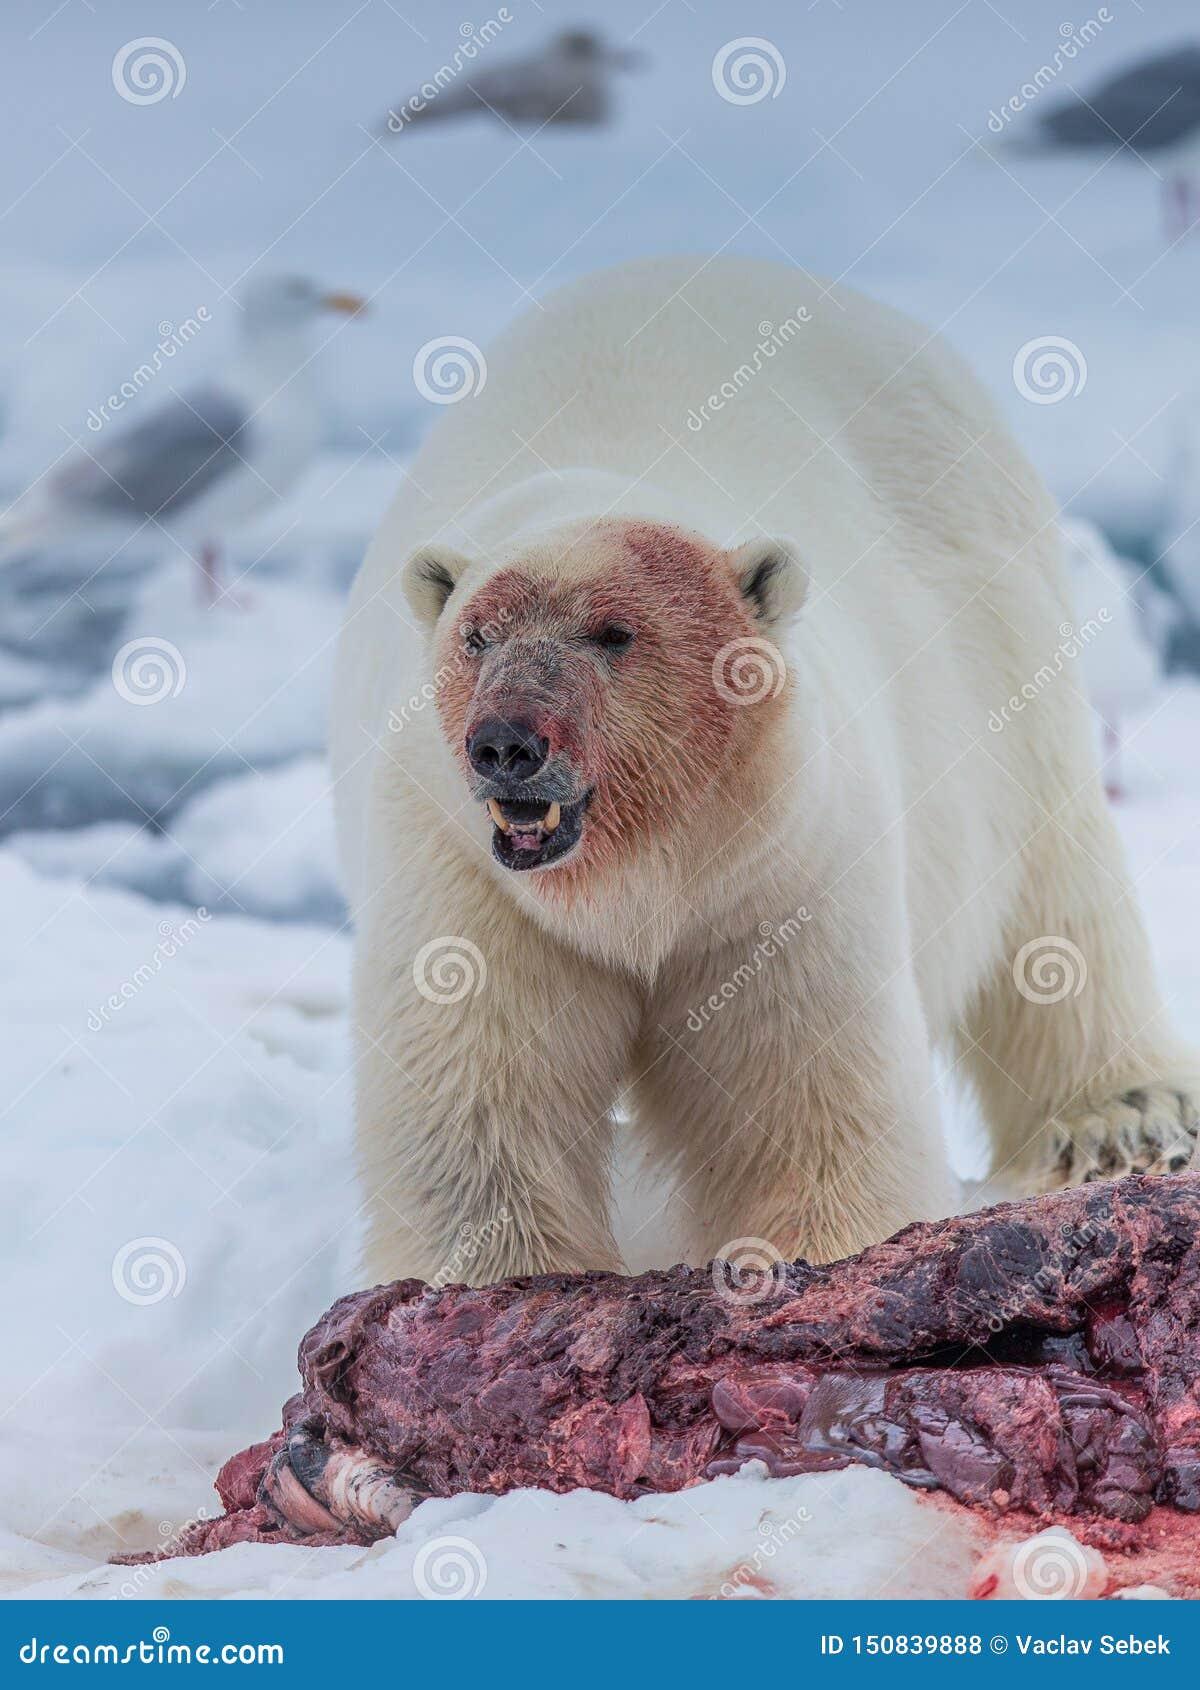 Polar Bear Ursus maritimus Spitsbergen North Ocean